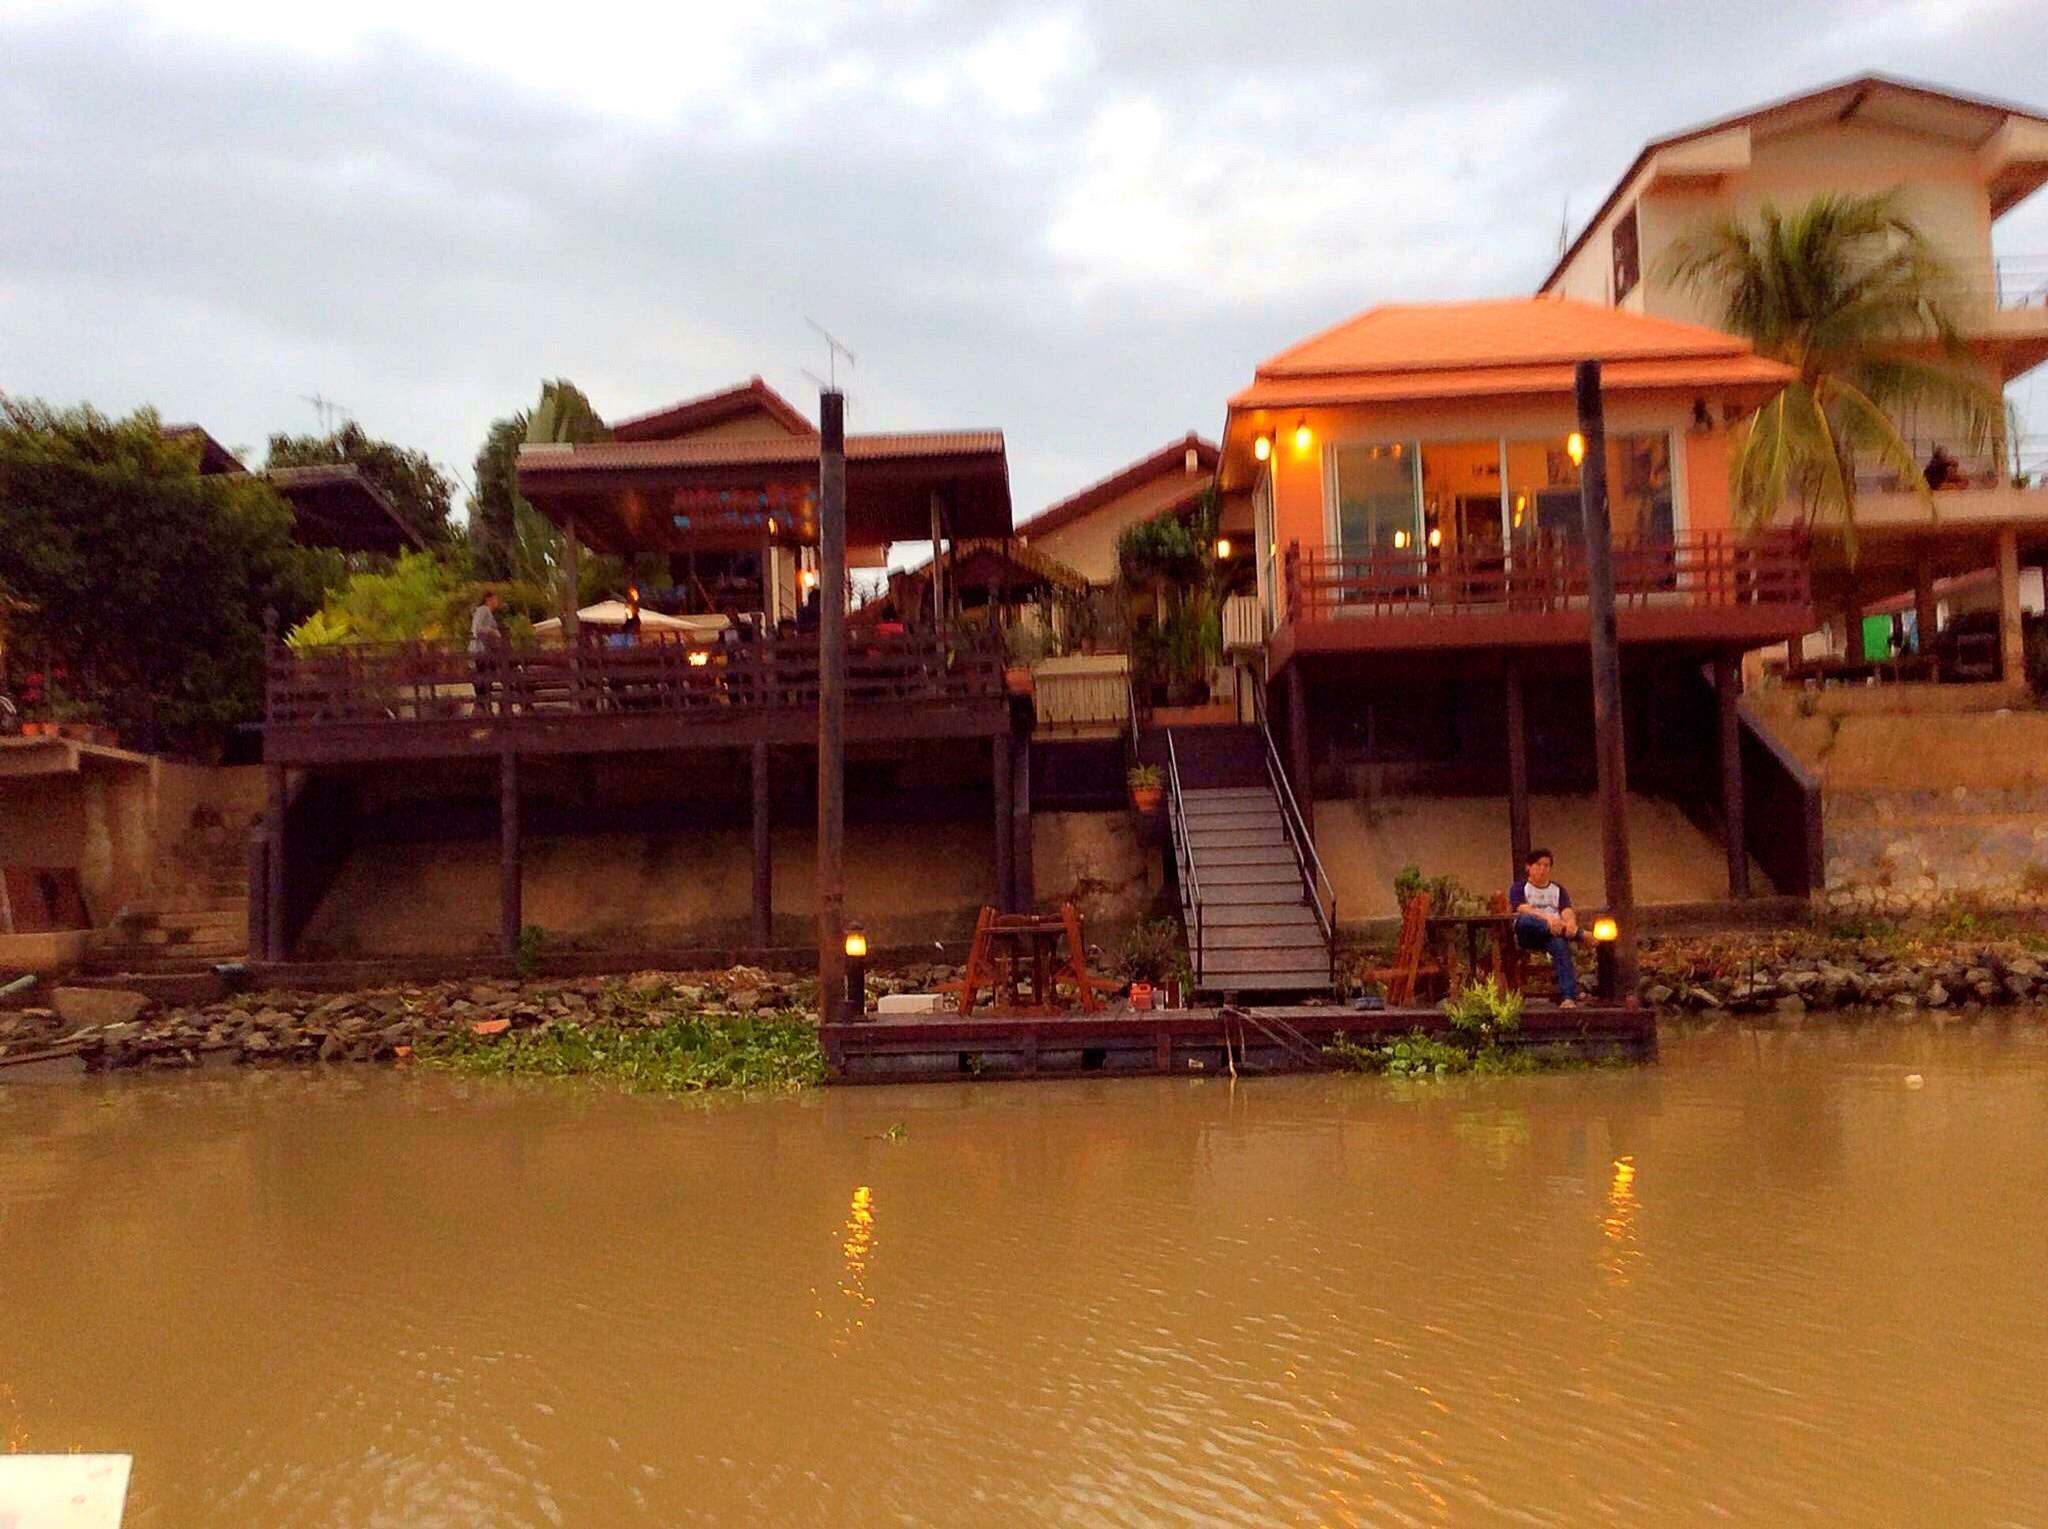 The Seven Seas Riverside Ayutthaya, Phra Nakhon Si Ayutthaya